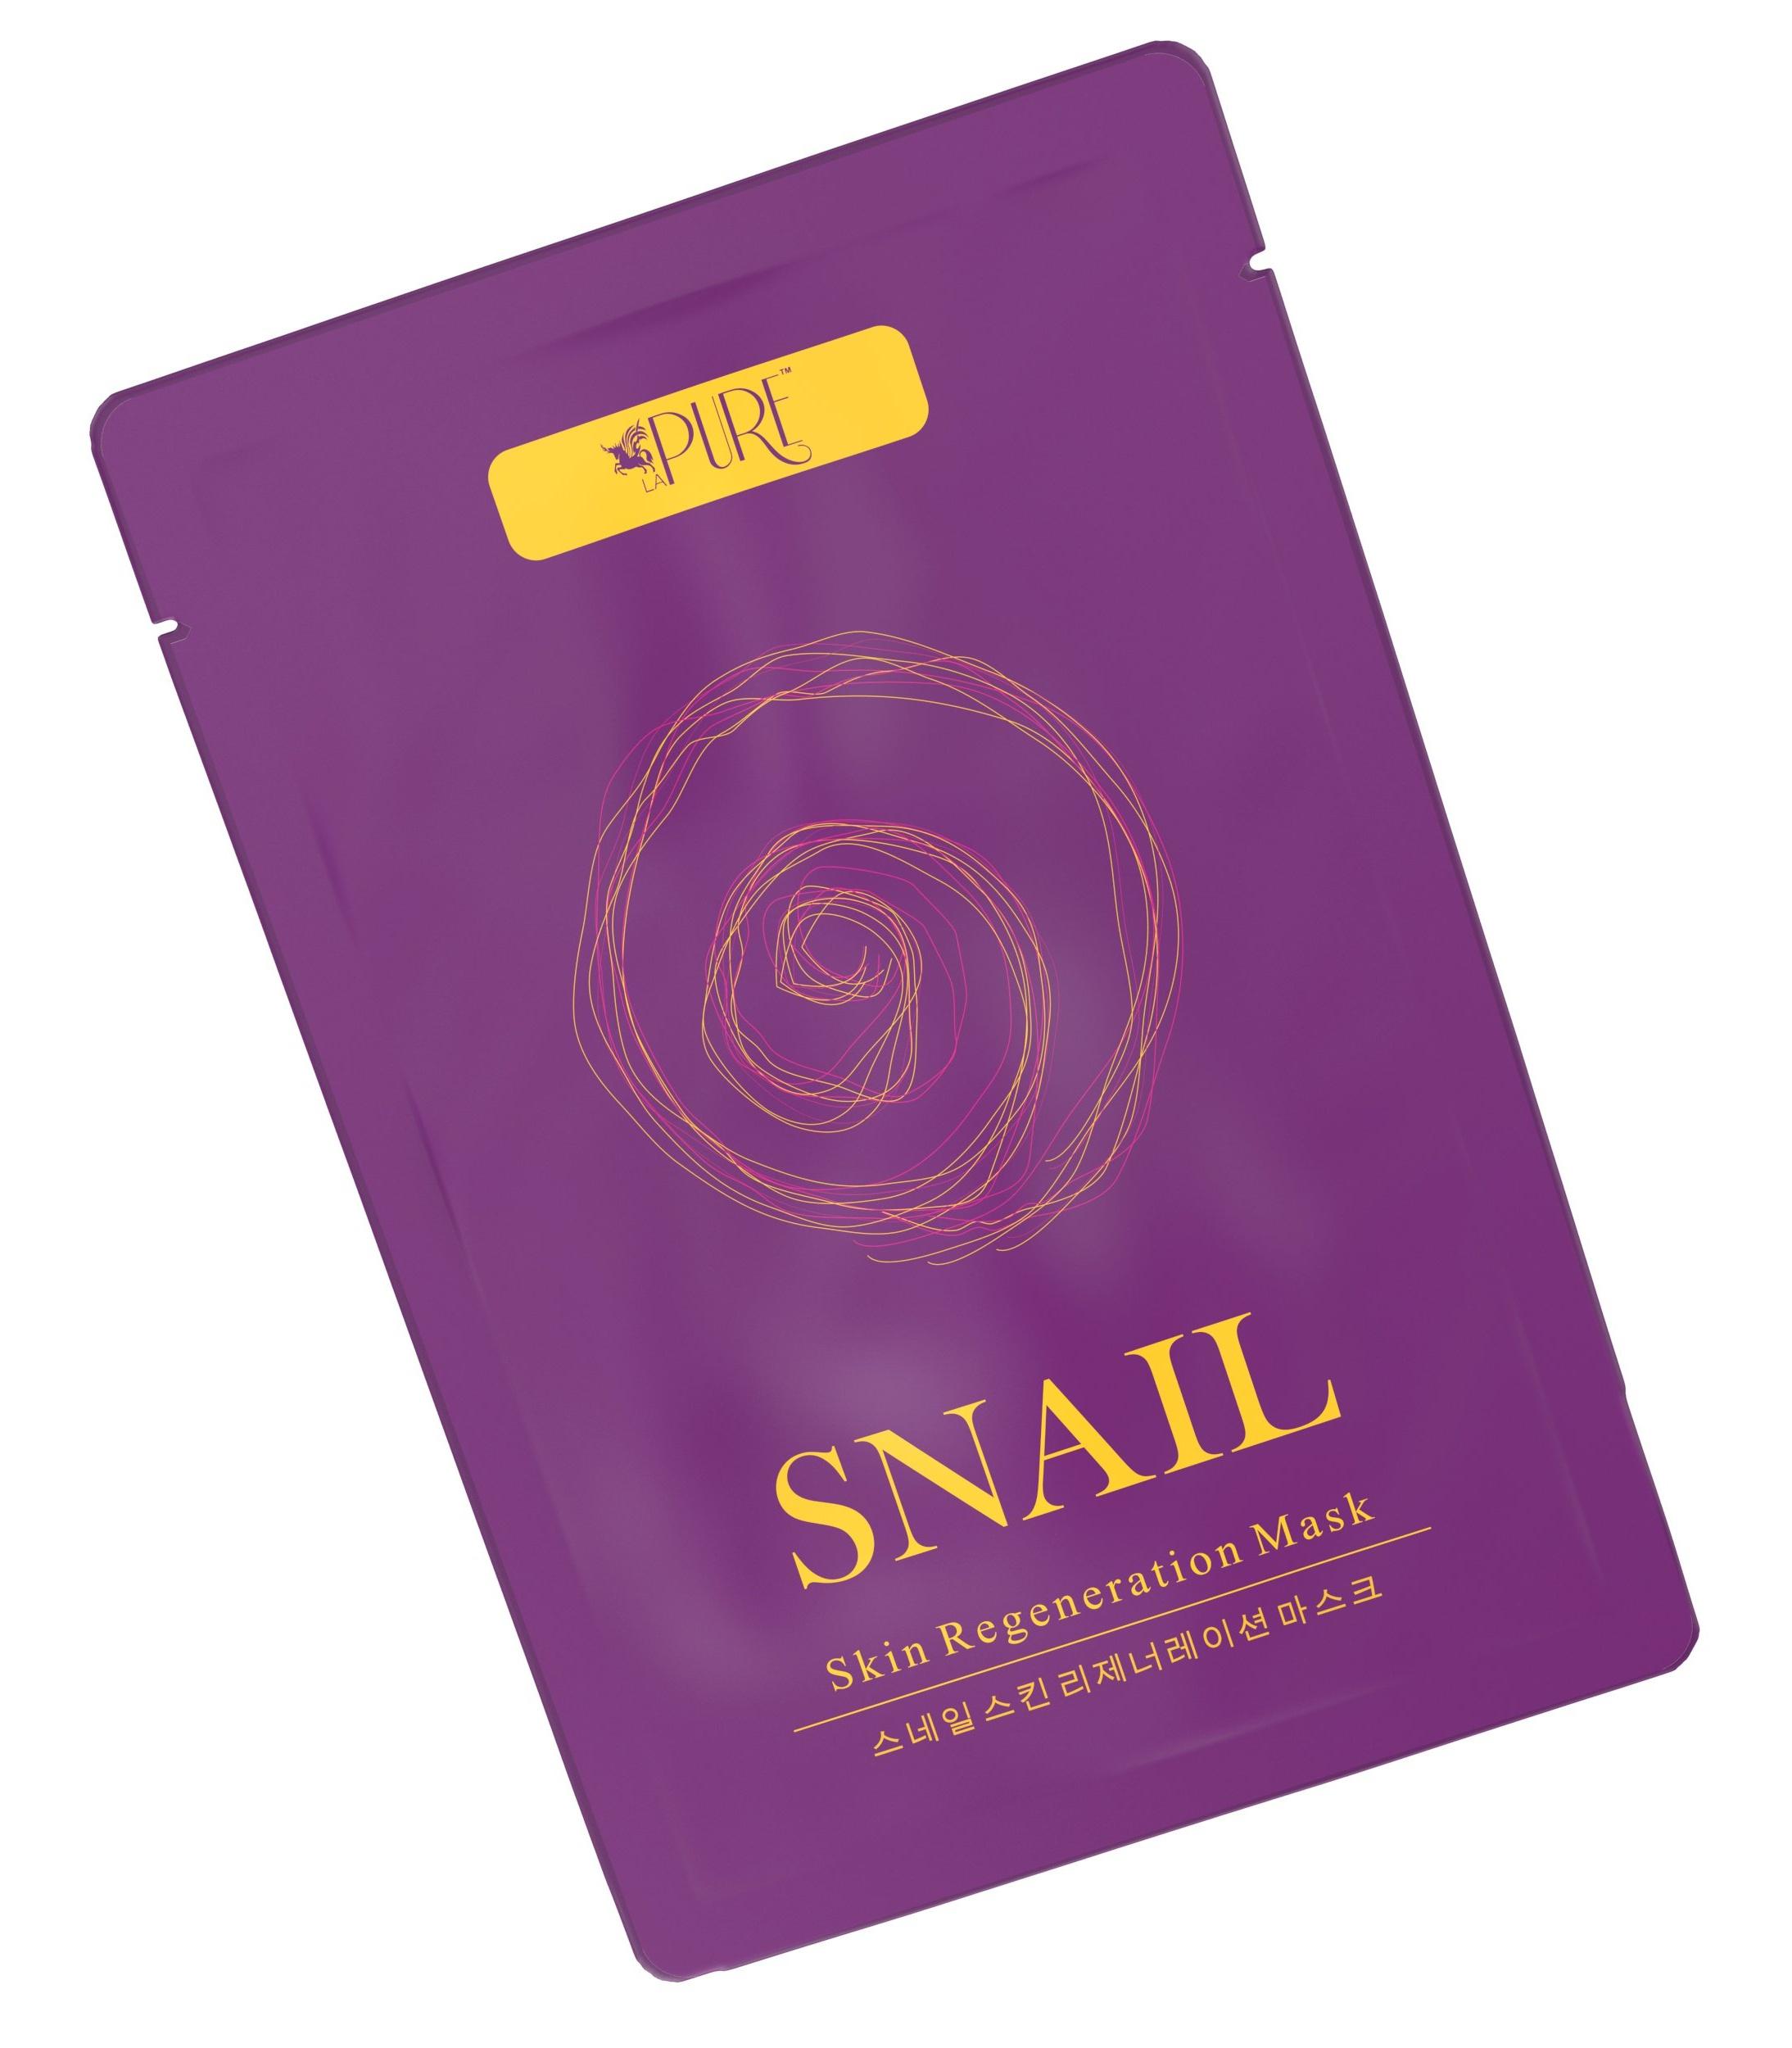 La Pure Snail Skin Regeneration Sheet Mask